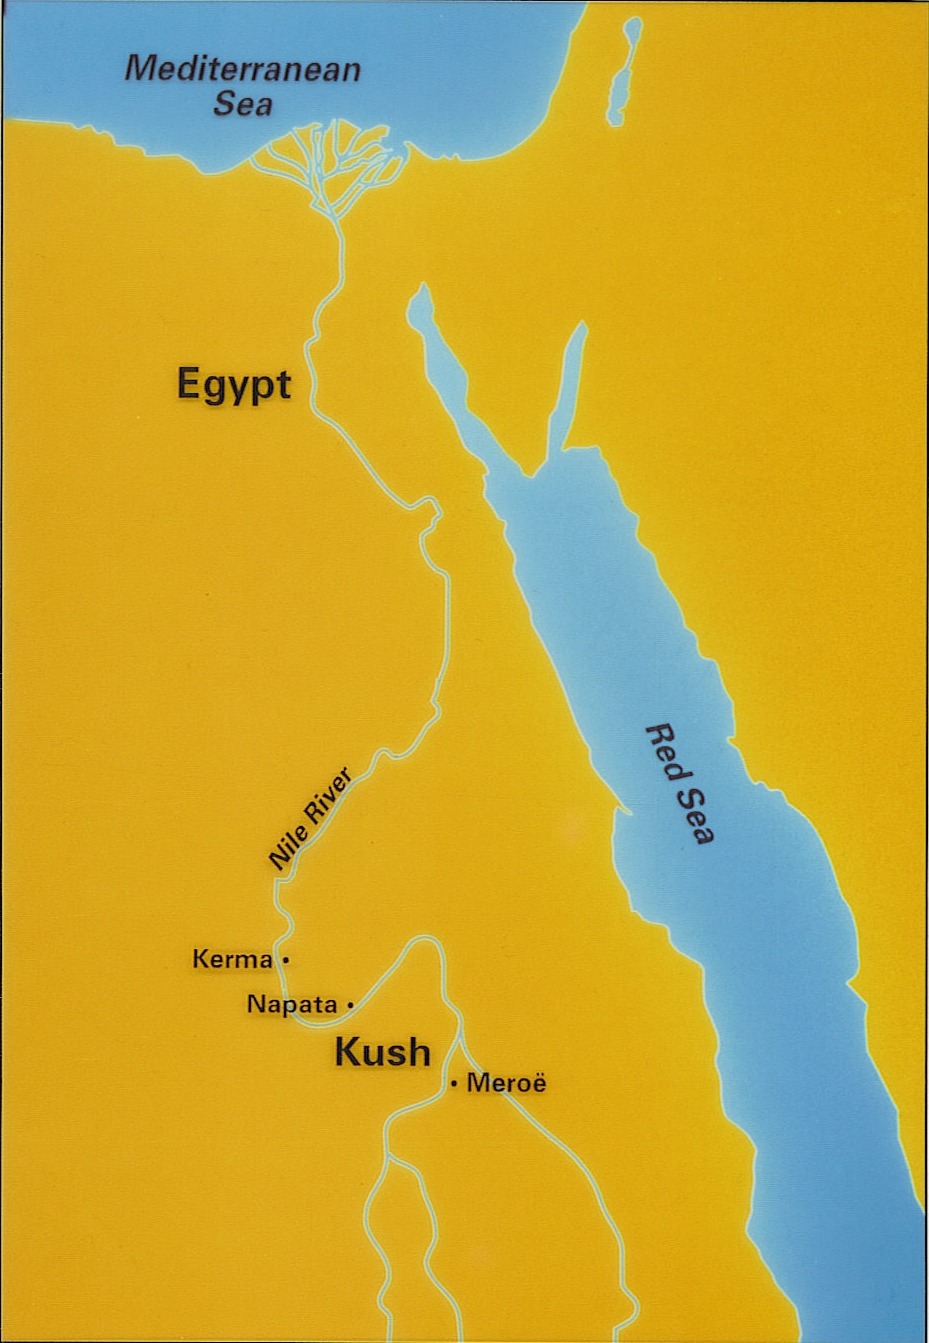 Museum Africa Origins of Museum Africa The Kingdom of Kush